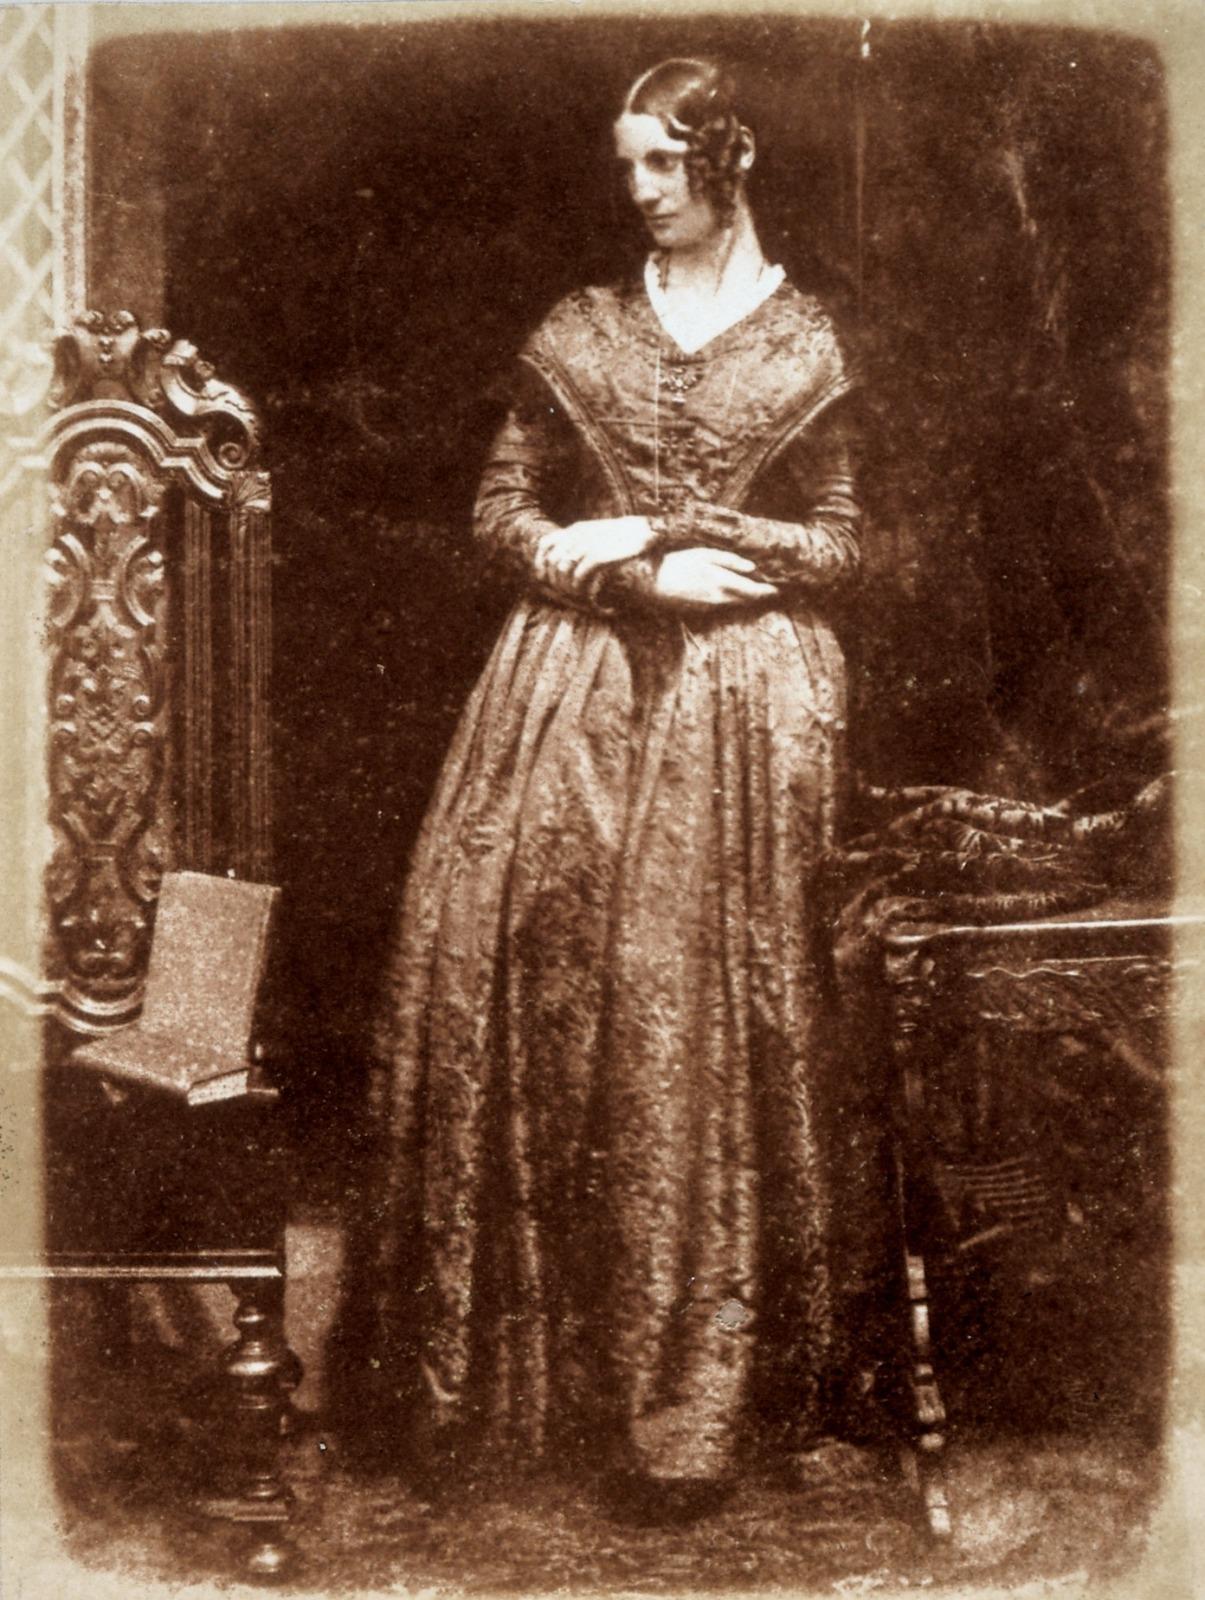 Mrs. Bell of Madras